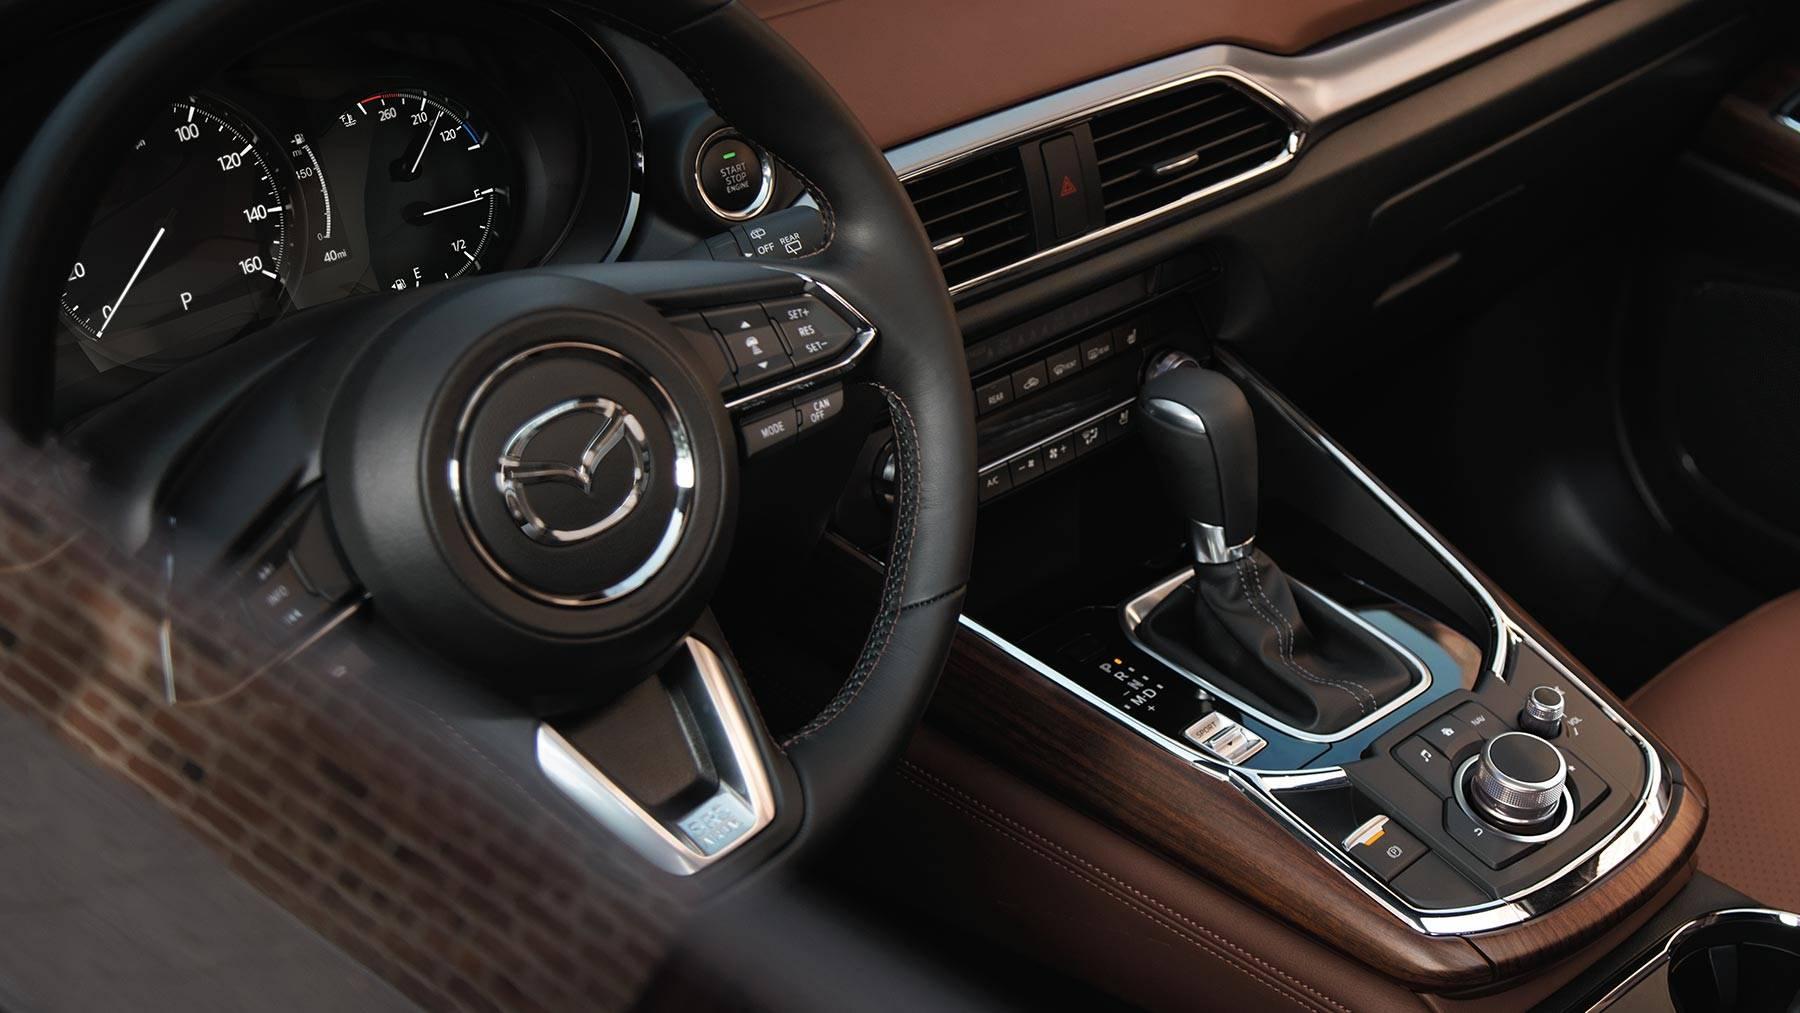 2019 Mazda CX-9 Driving Technology